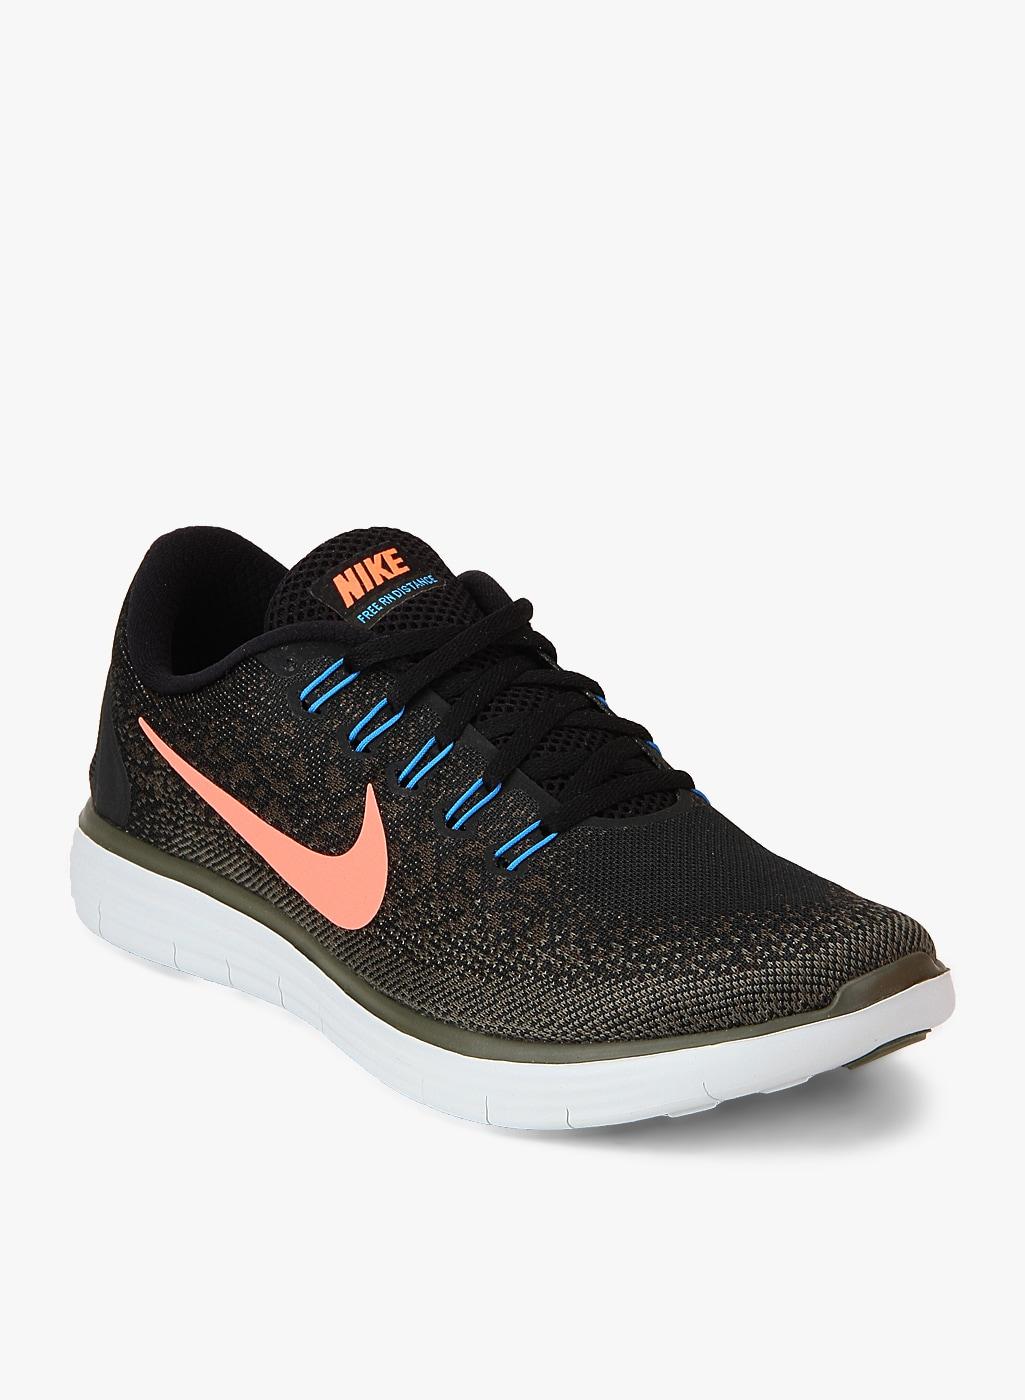 Nike Free Rn Distance Black Running Shoes